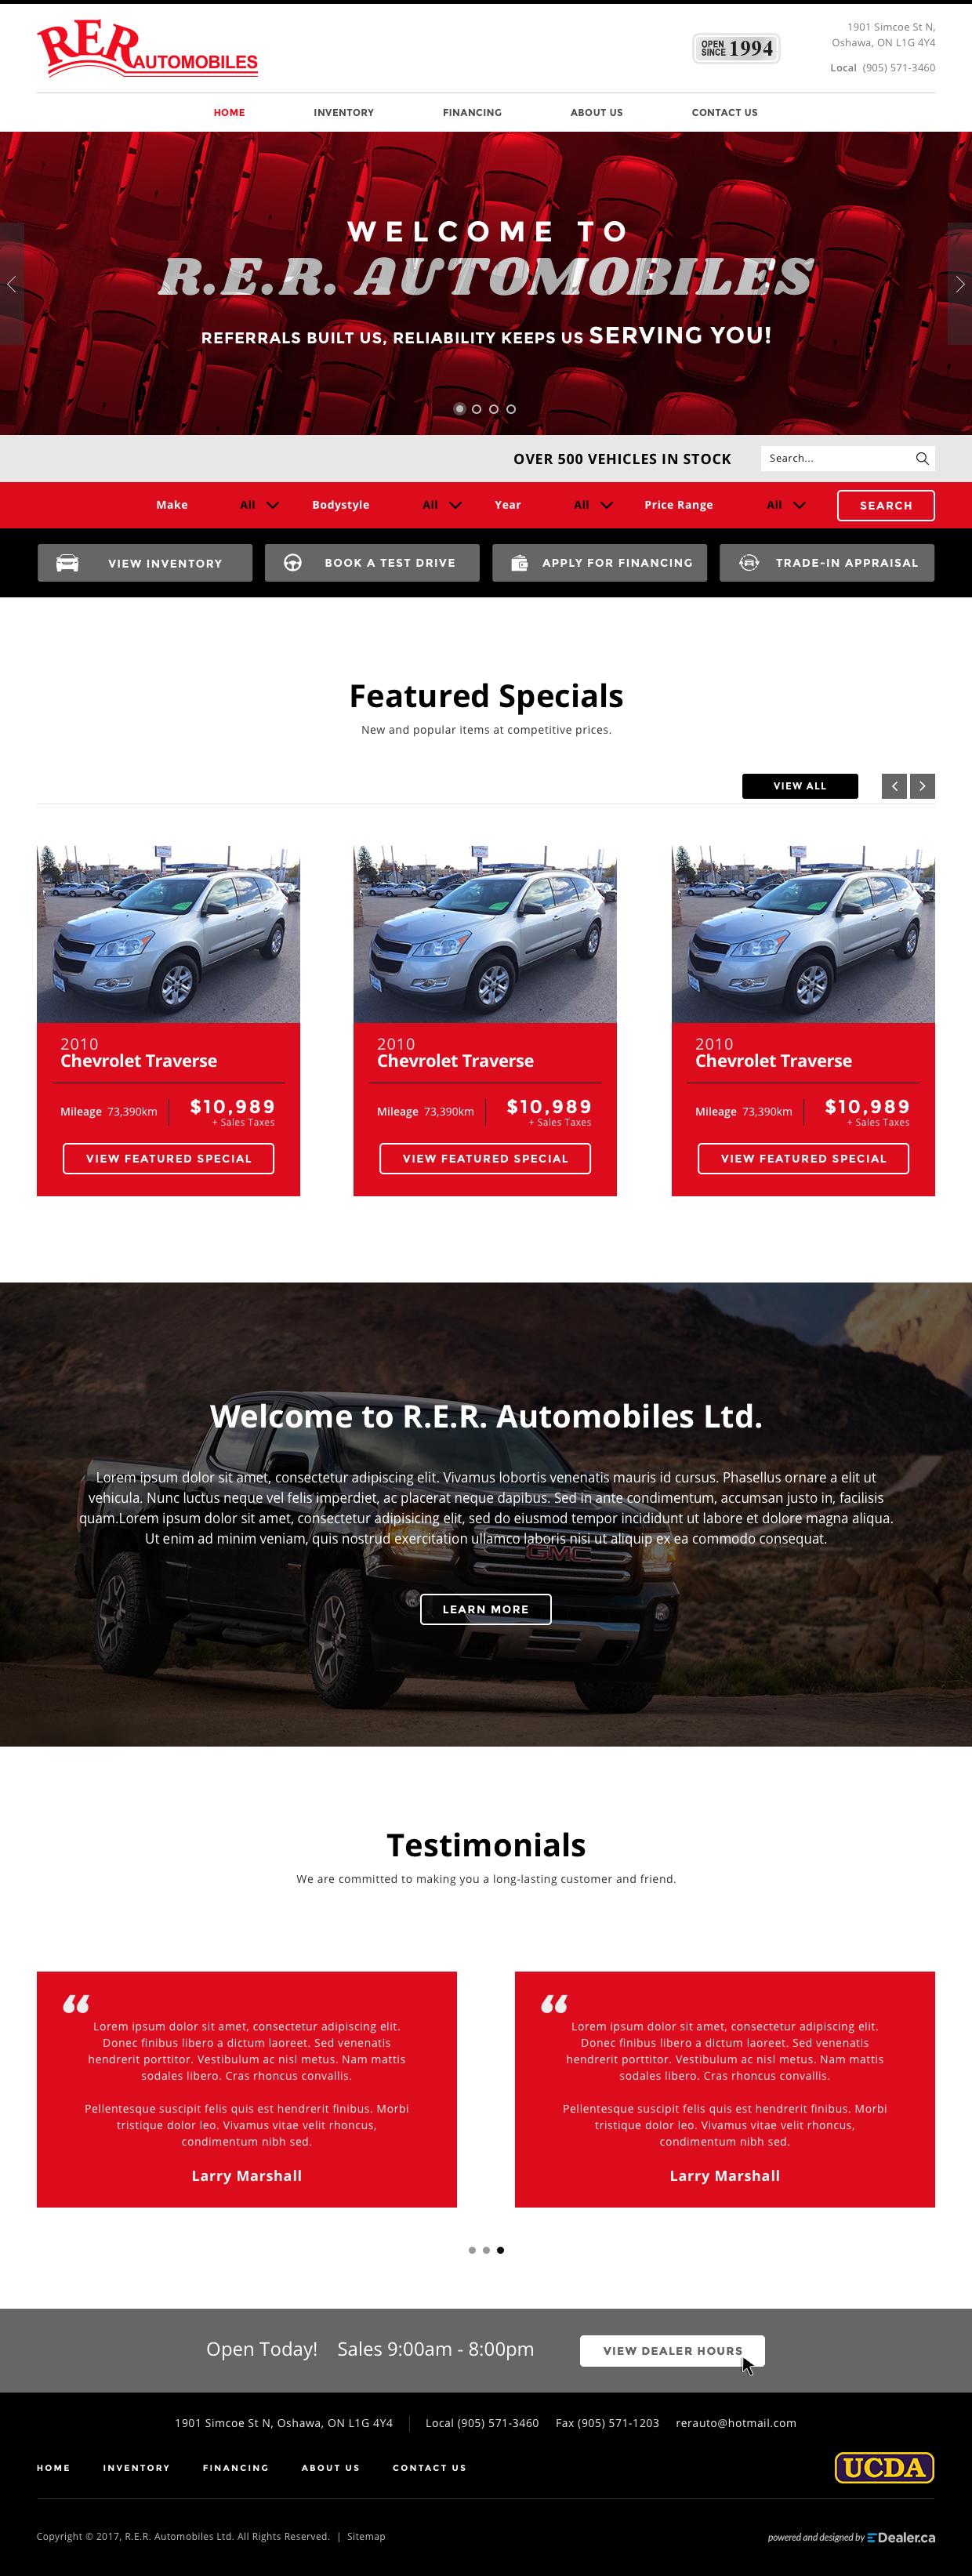 R.E.R.AutomobilesLtd.-1240px-final